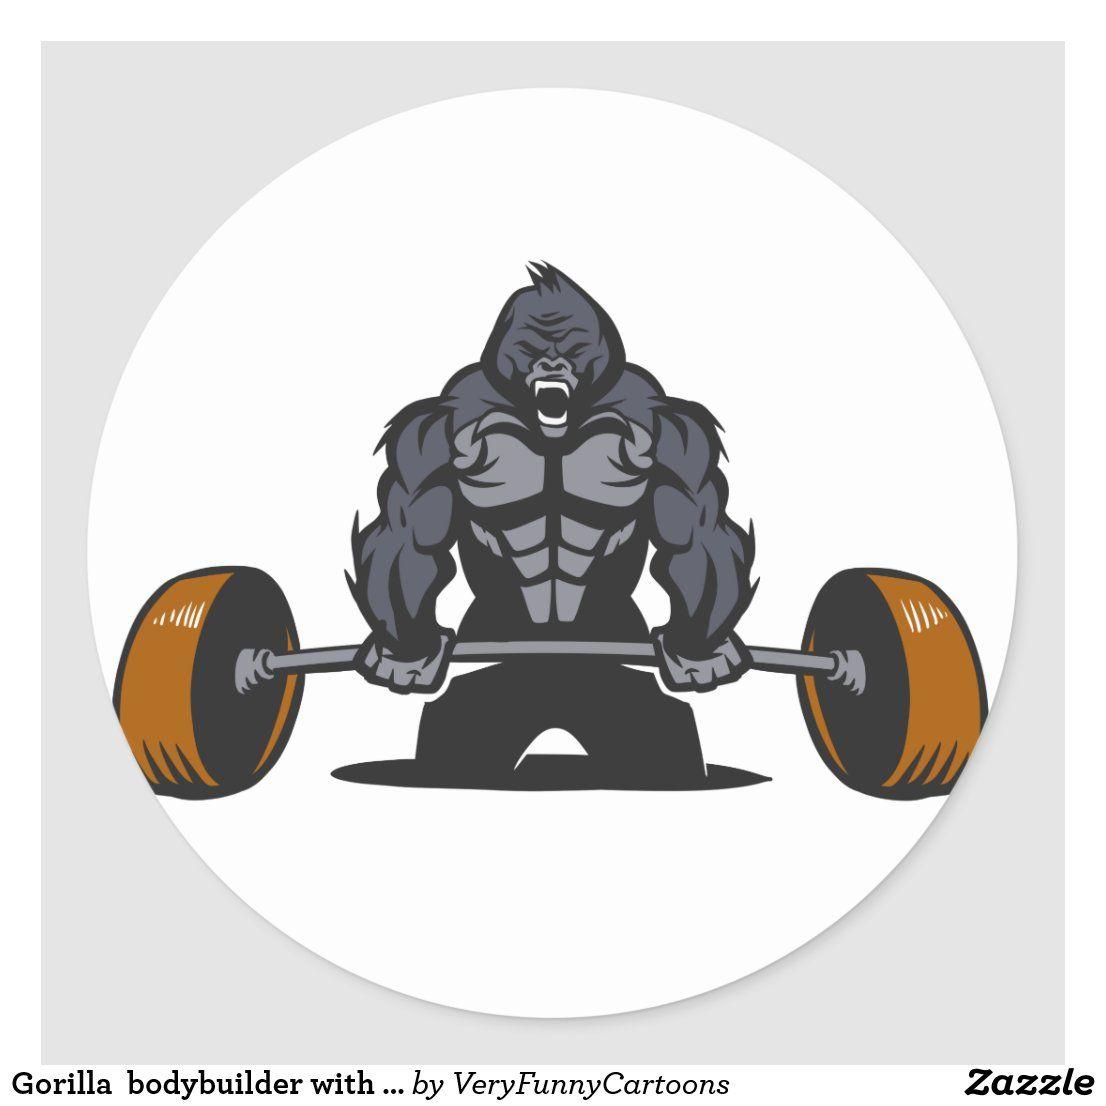 Gorilla Bodybuilder With A Barbell Classic Round Sticker Zazzle Com In 2021 Animal Cartoon Illustration Cartoon Train Cartoon Illustration